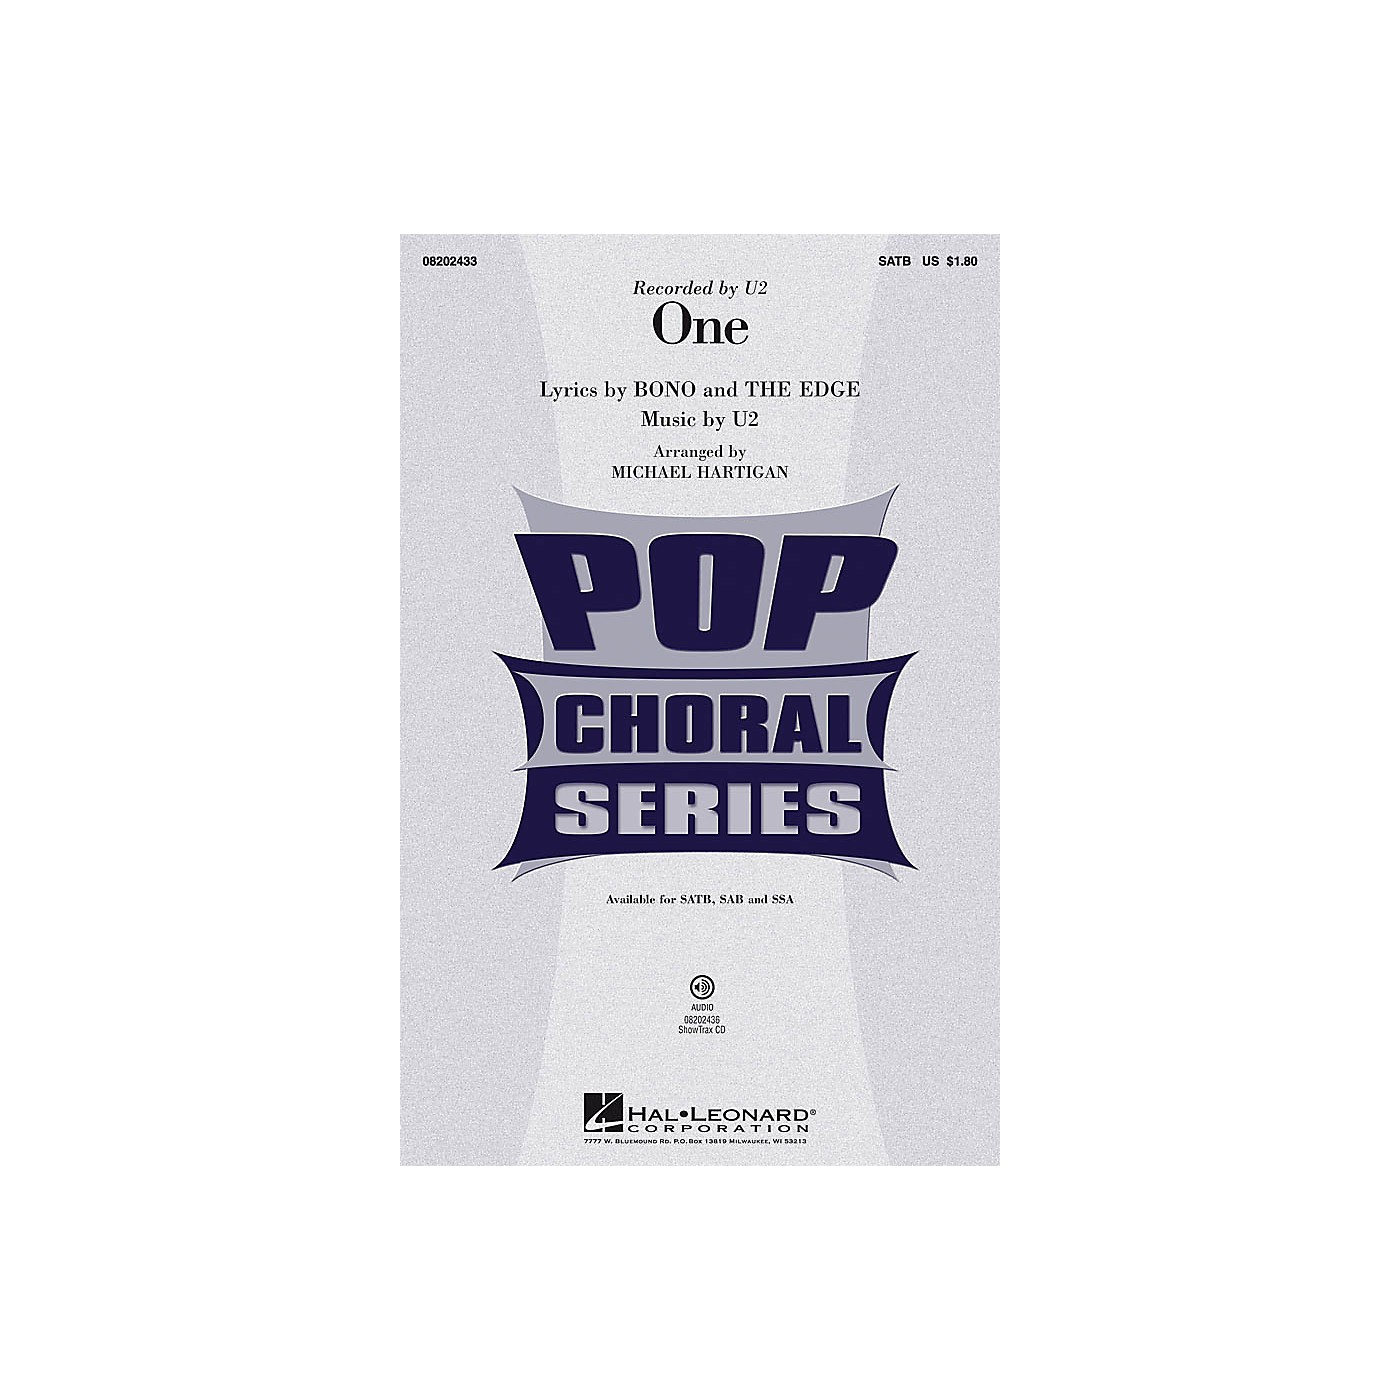 Hal Leonard One ShowTrax CD by U2 Arranged by Michael Hartigan thumbnail